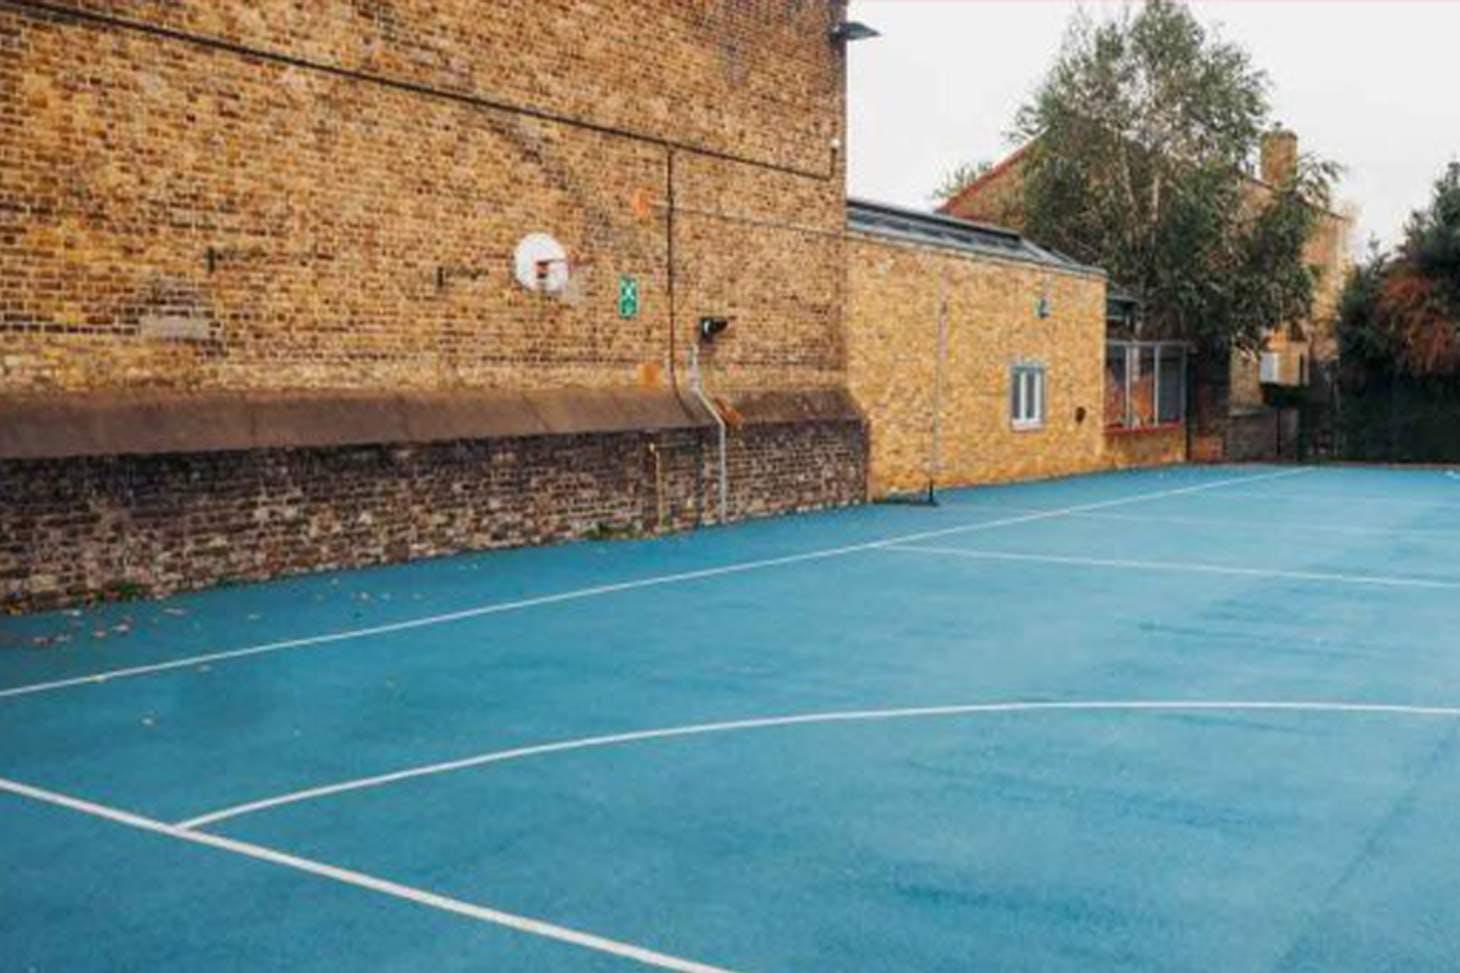 Bridge Hungerford School Court | Hard (macadam) netball court